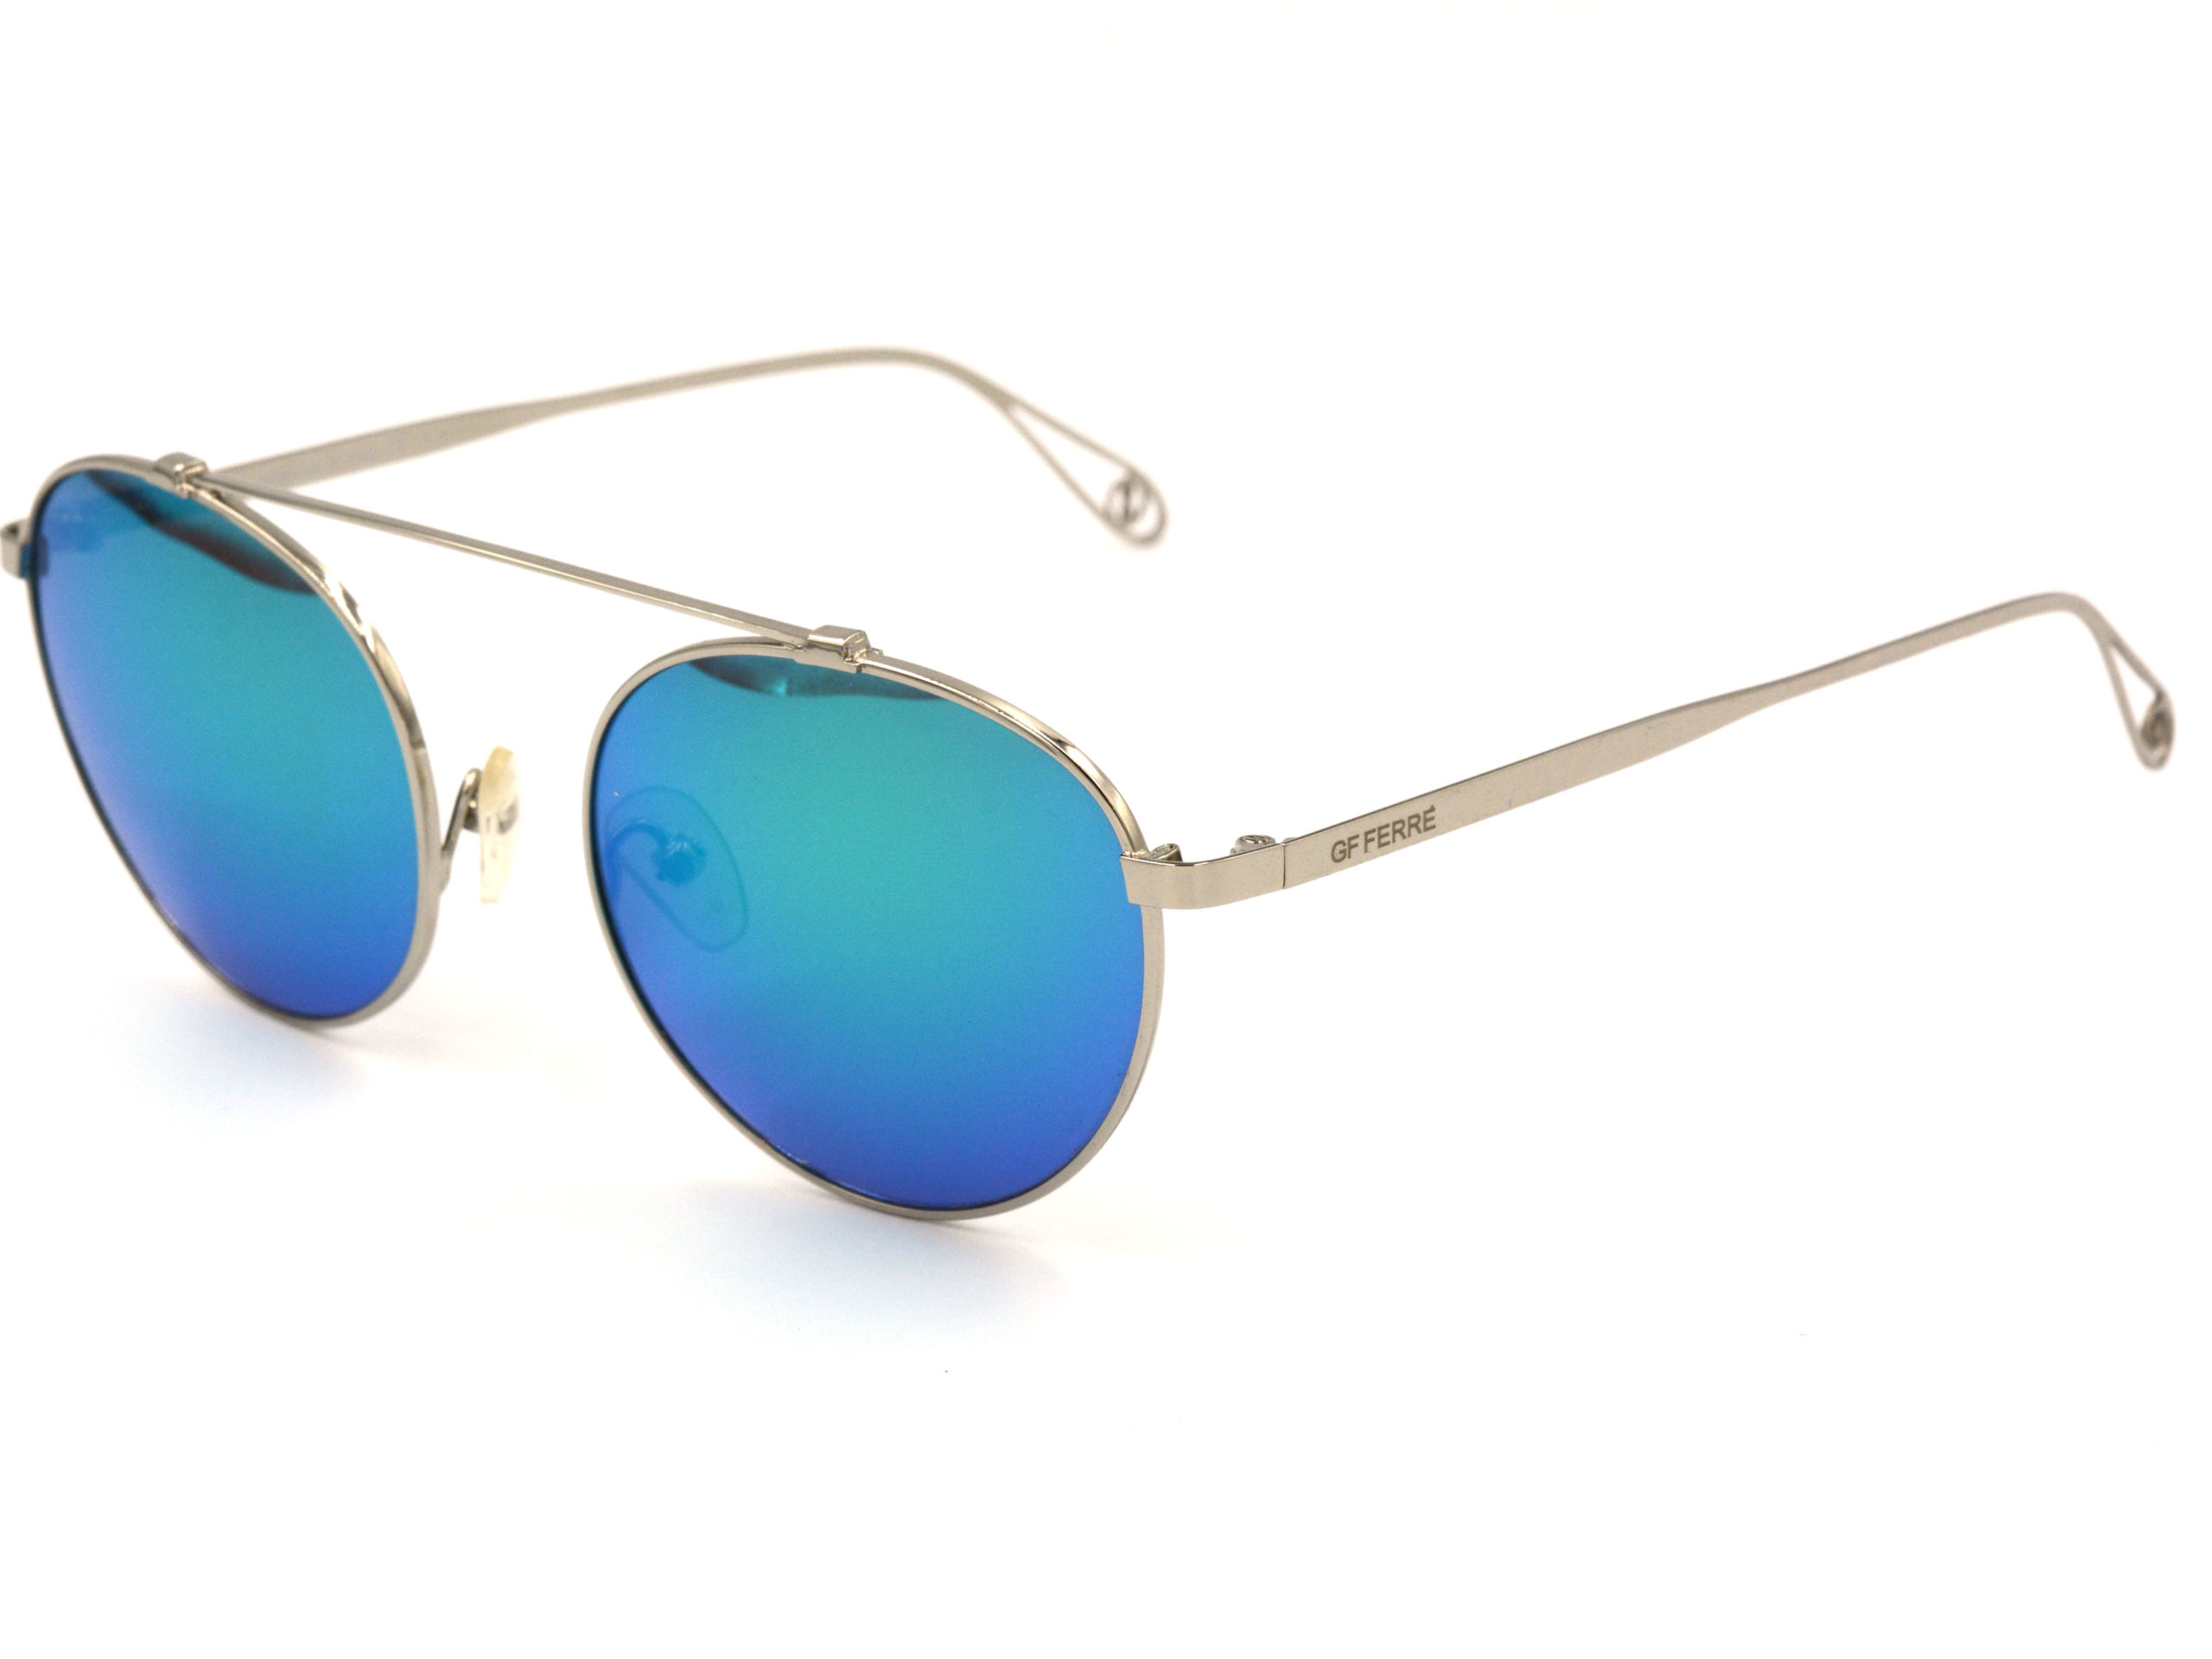 GF FERRE GFF7010 001 unisex Sunglasses 2020